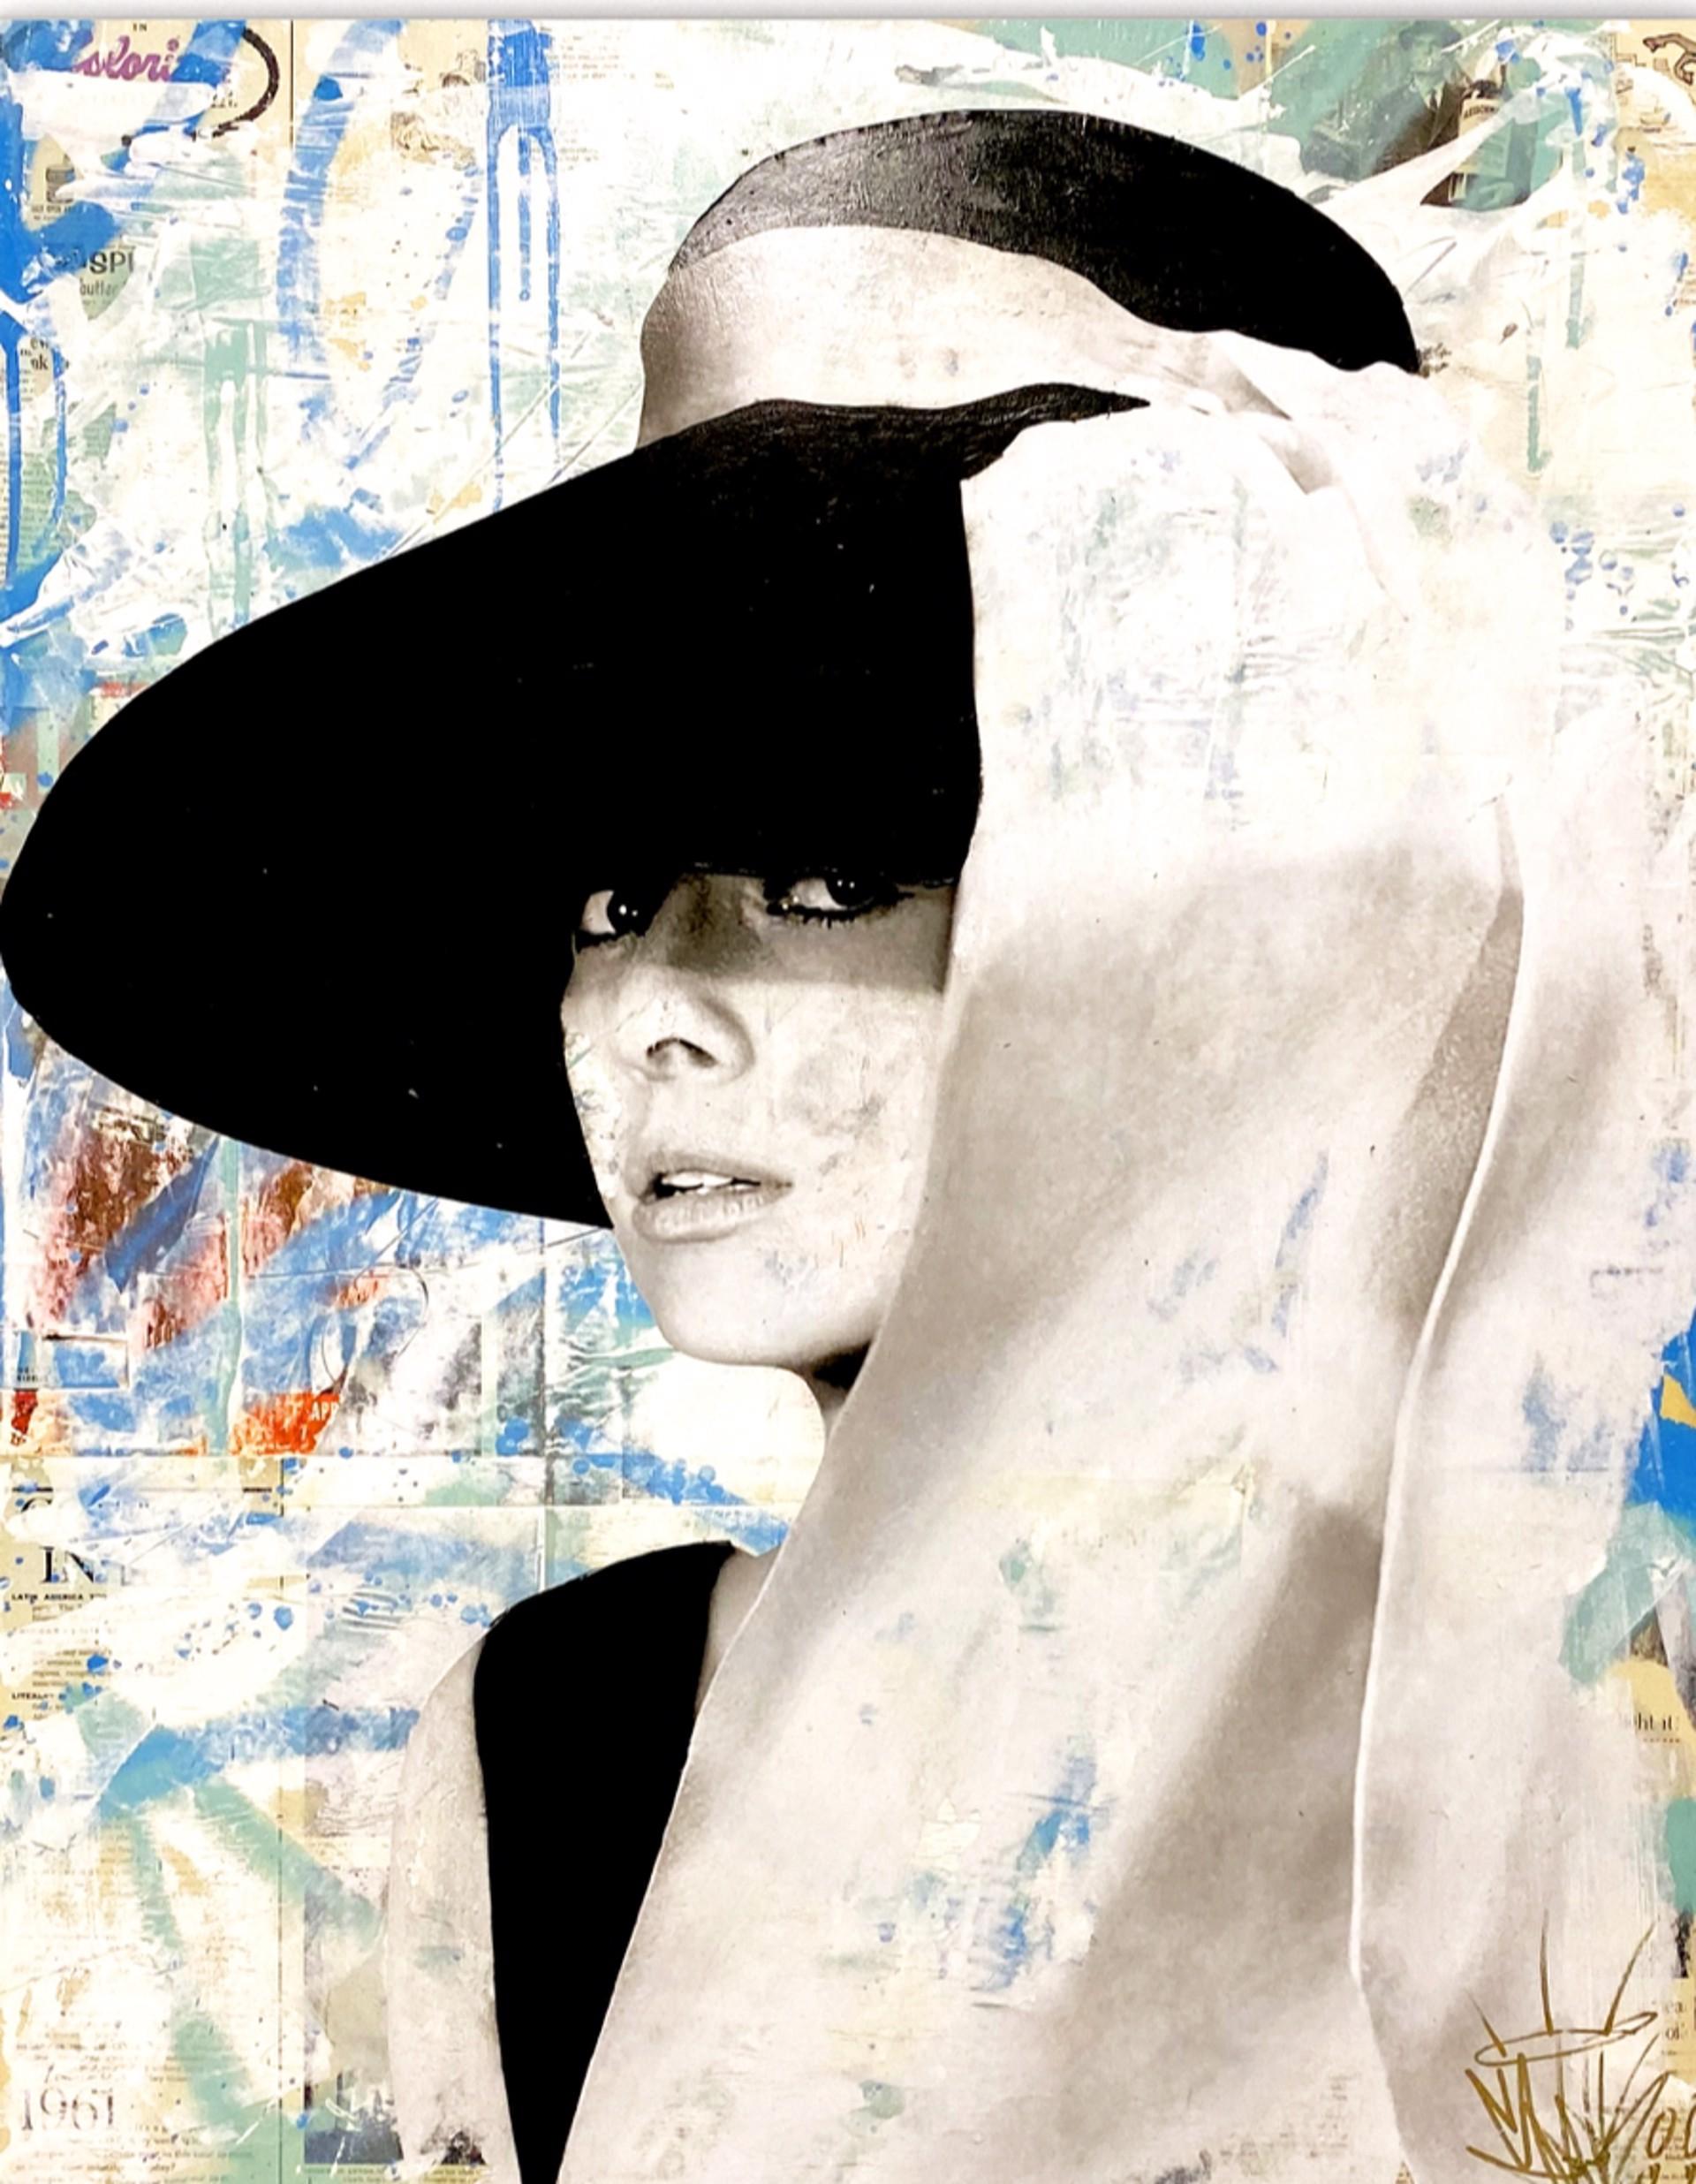 Audrey by Seek One